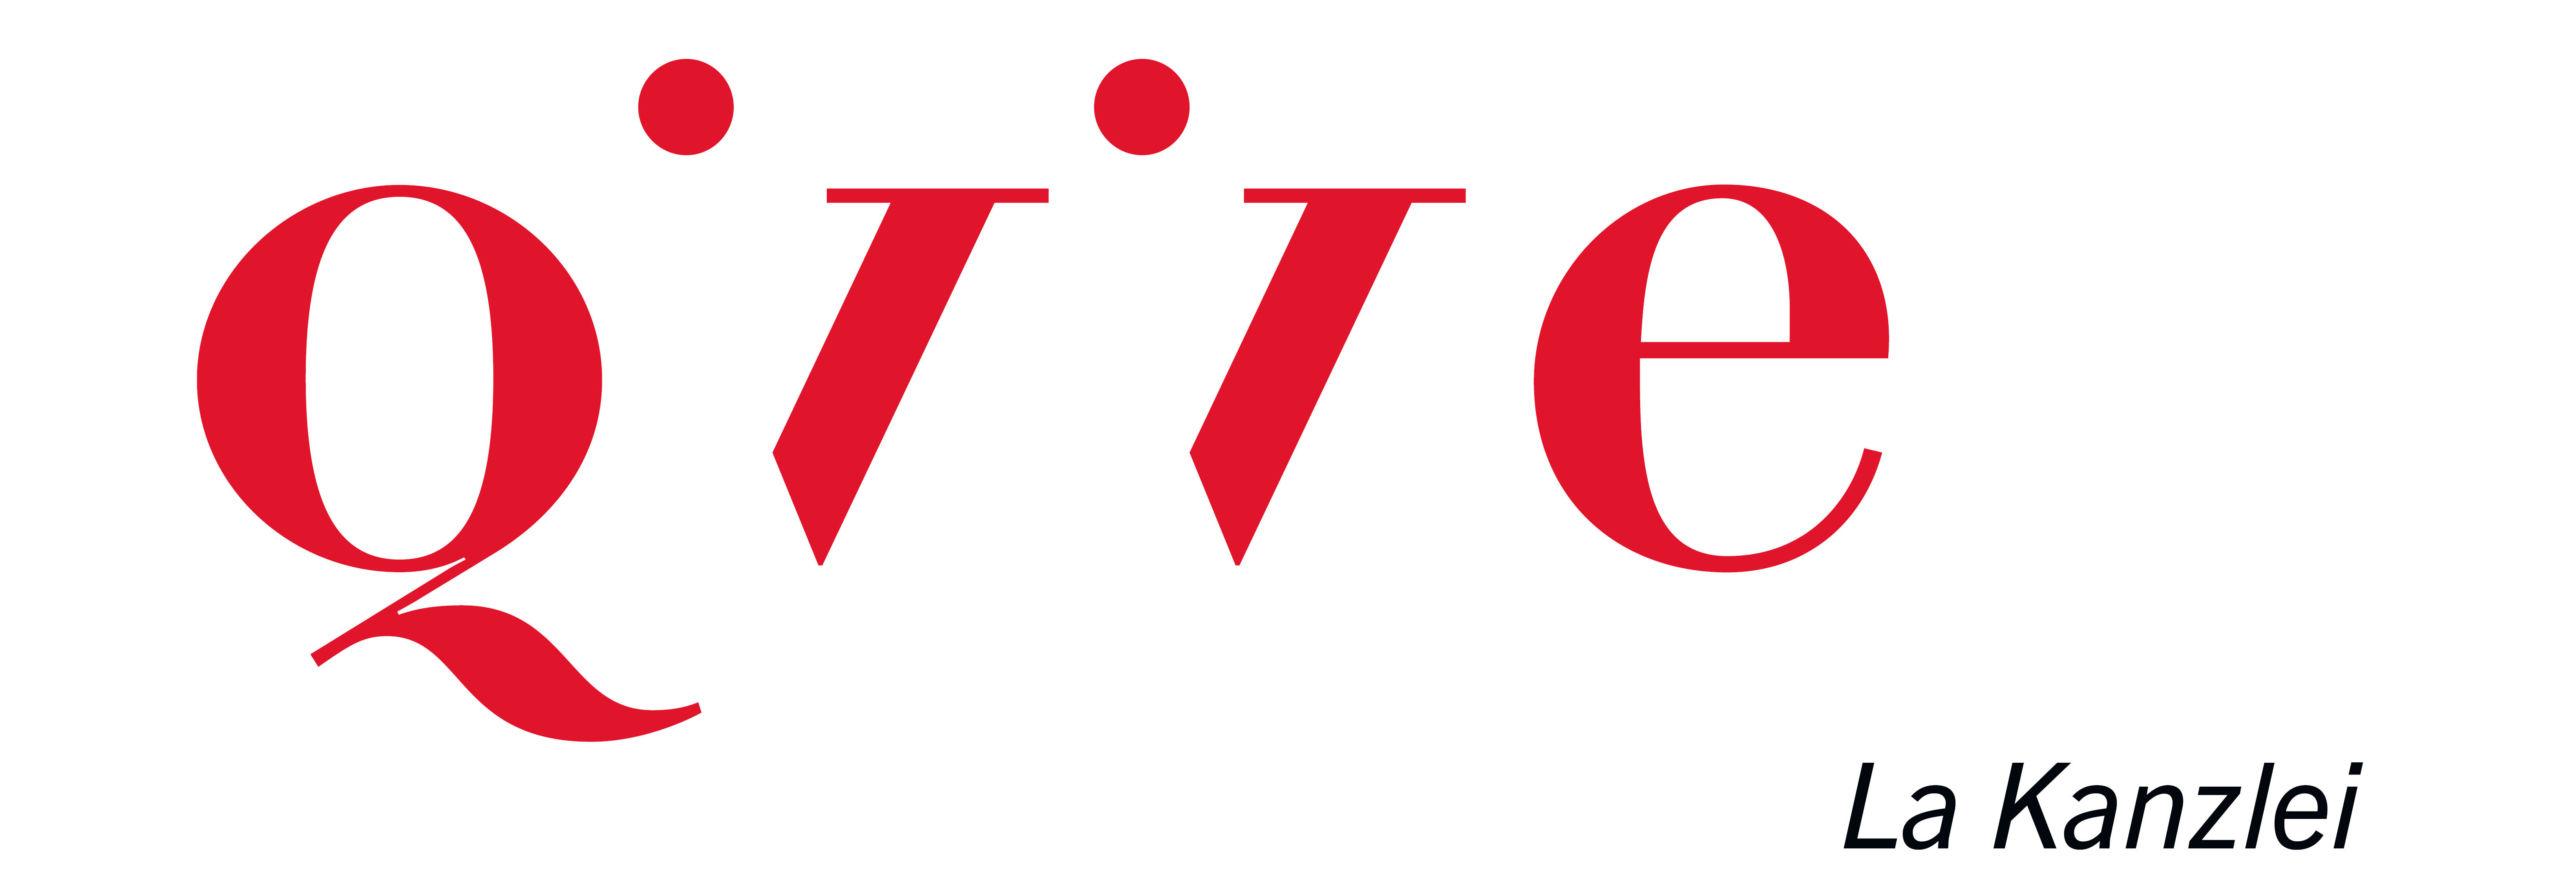 Logo Qivive